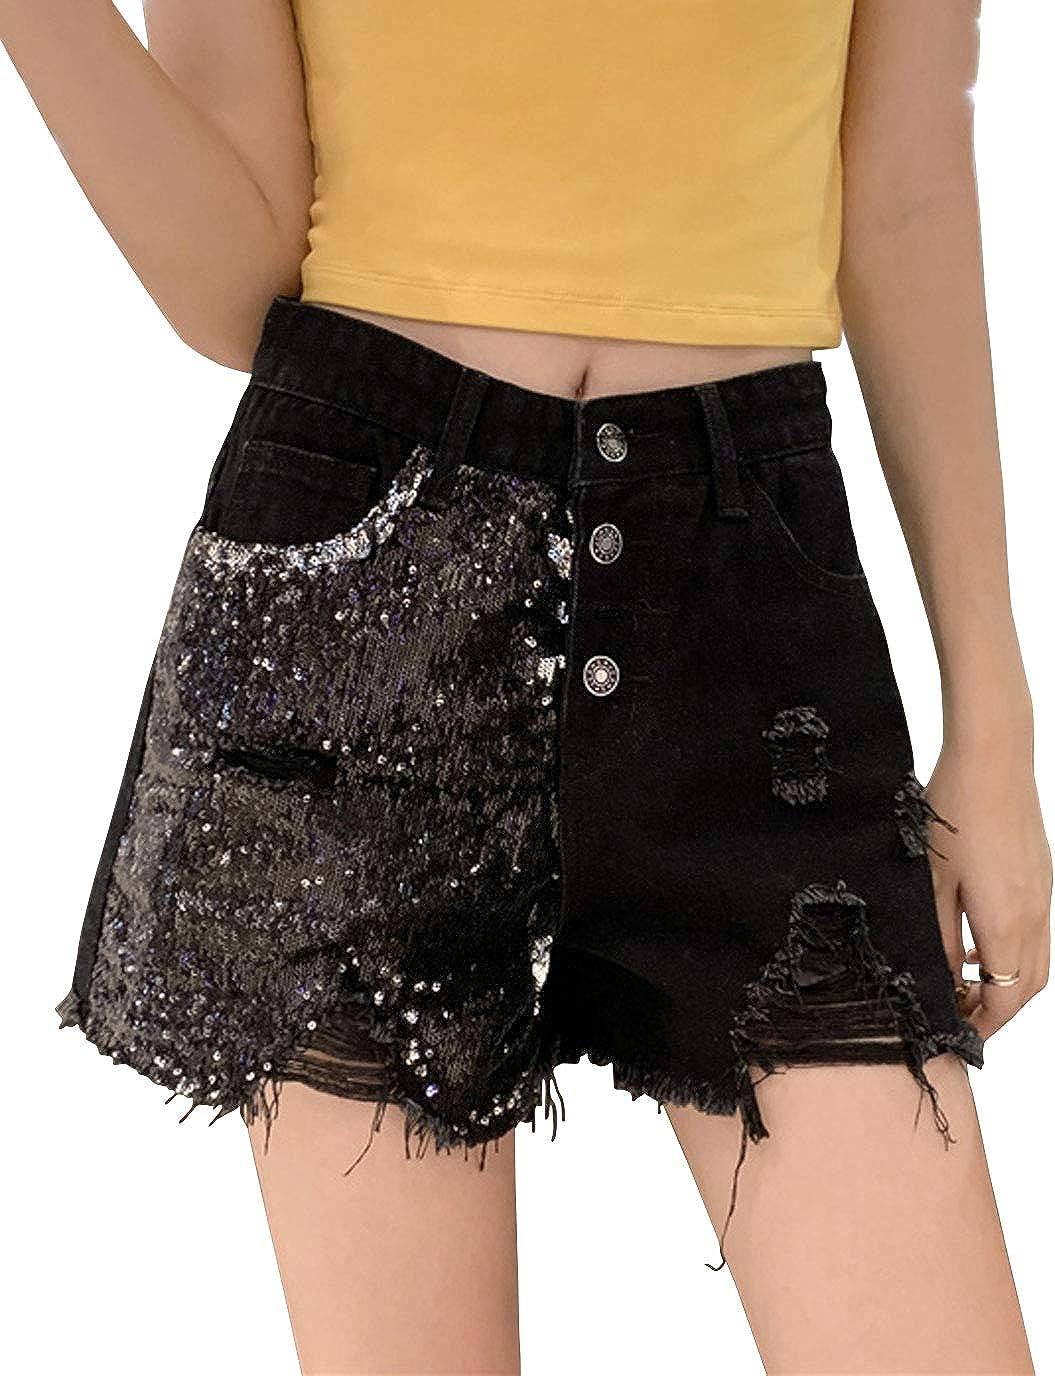 ebossy Women's Glitter Sequin High Waist Raw Hem Ripped Cutoff Jean Shorts